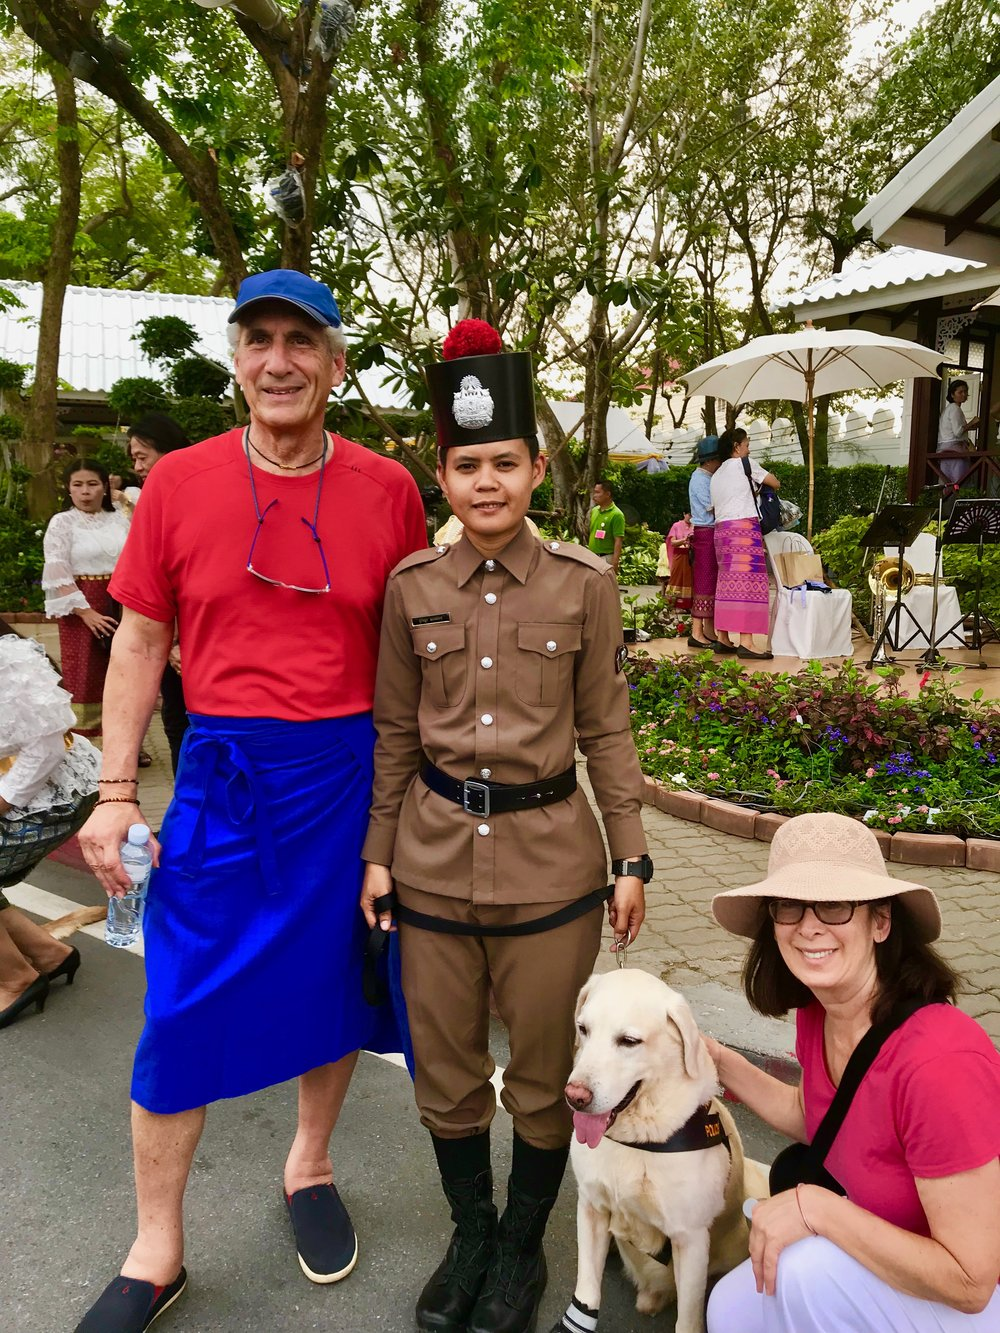 Cecile, Me, Police woman & Dog.jpg*.jpg